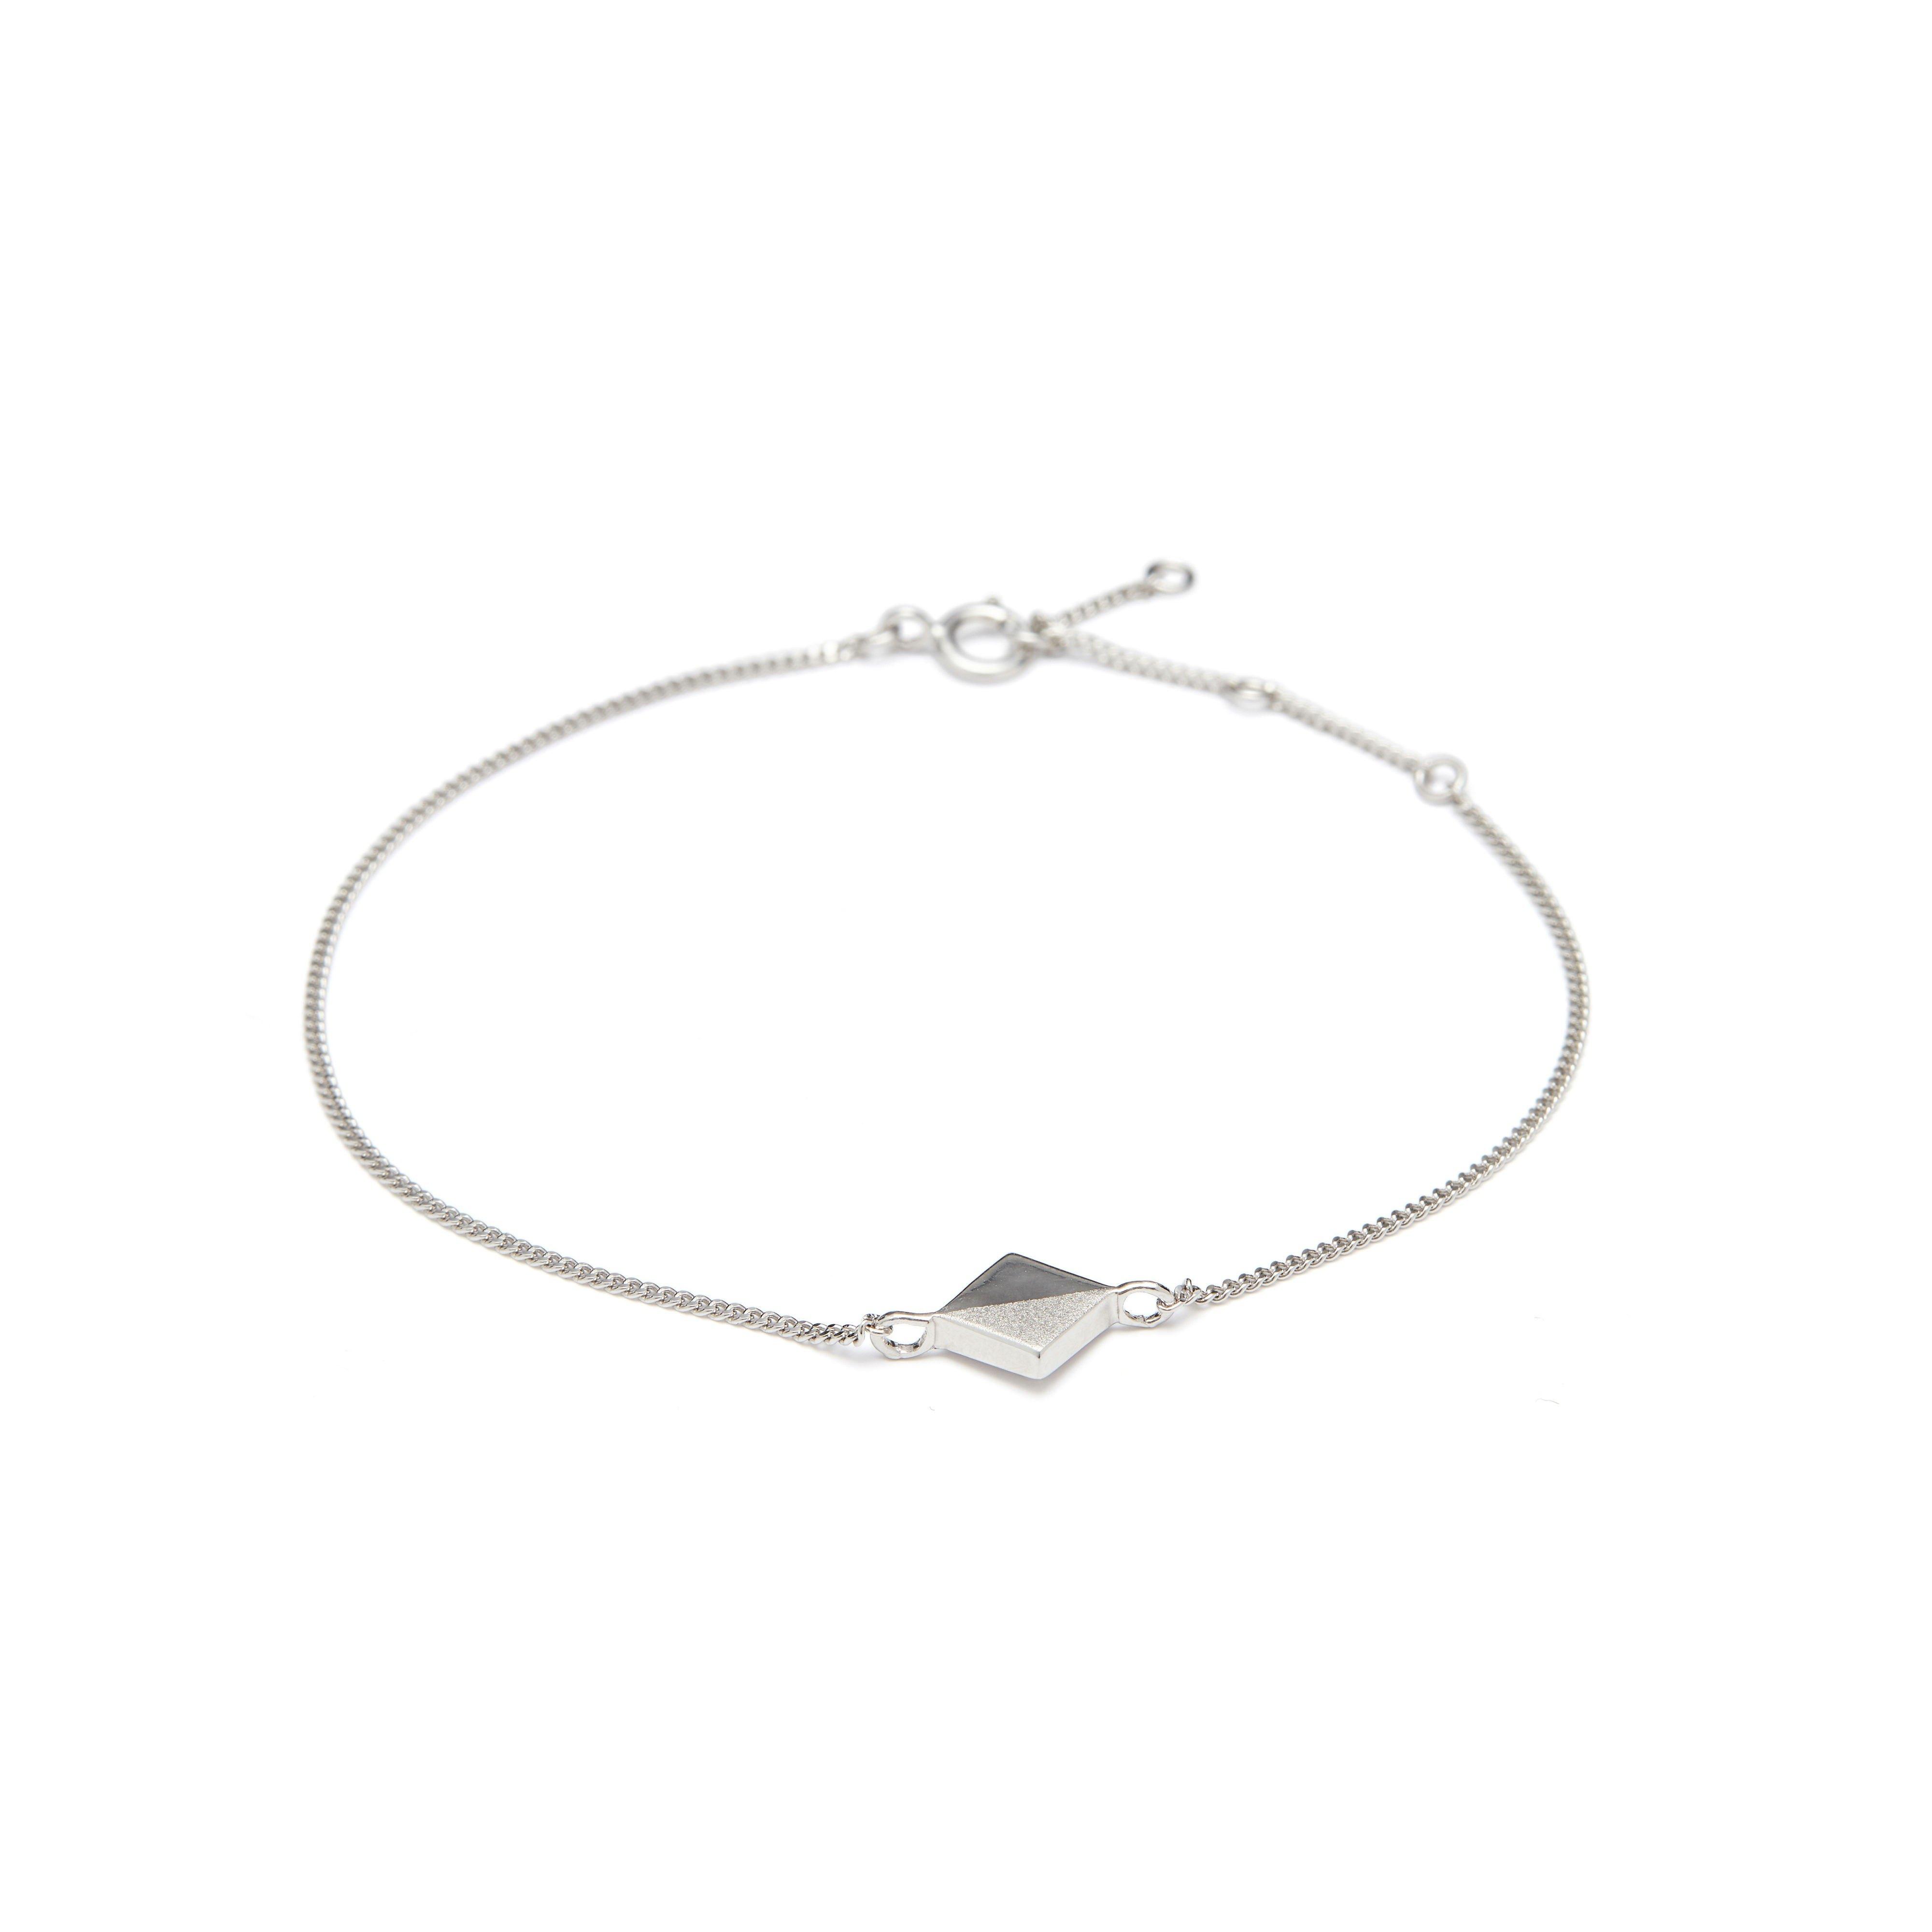 https://www.selecteddesigners.dk/media/catalog/product/p/i/pixel_02-03_silver.jpg